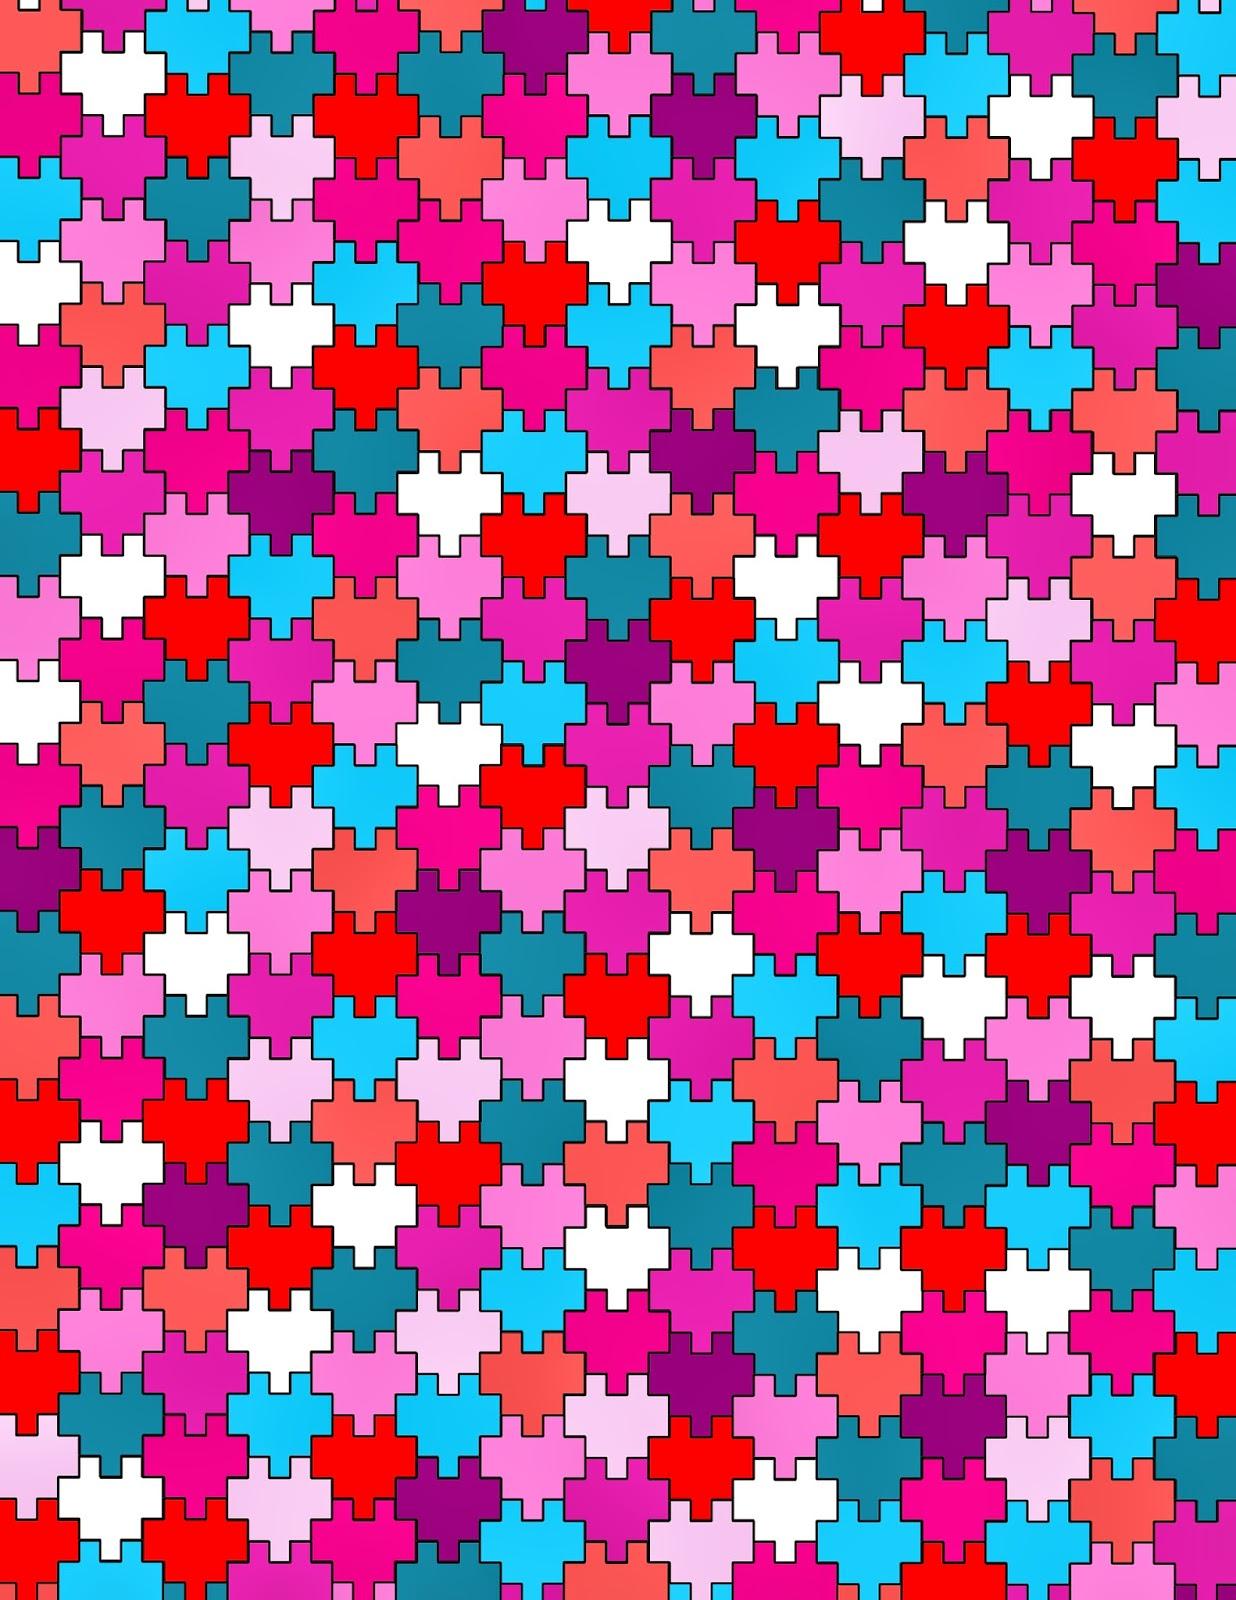 Doodlecraft Minecraft Pixel Heart Tessellation Free Printable